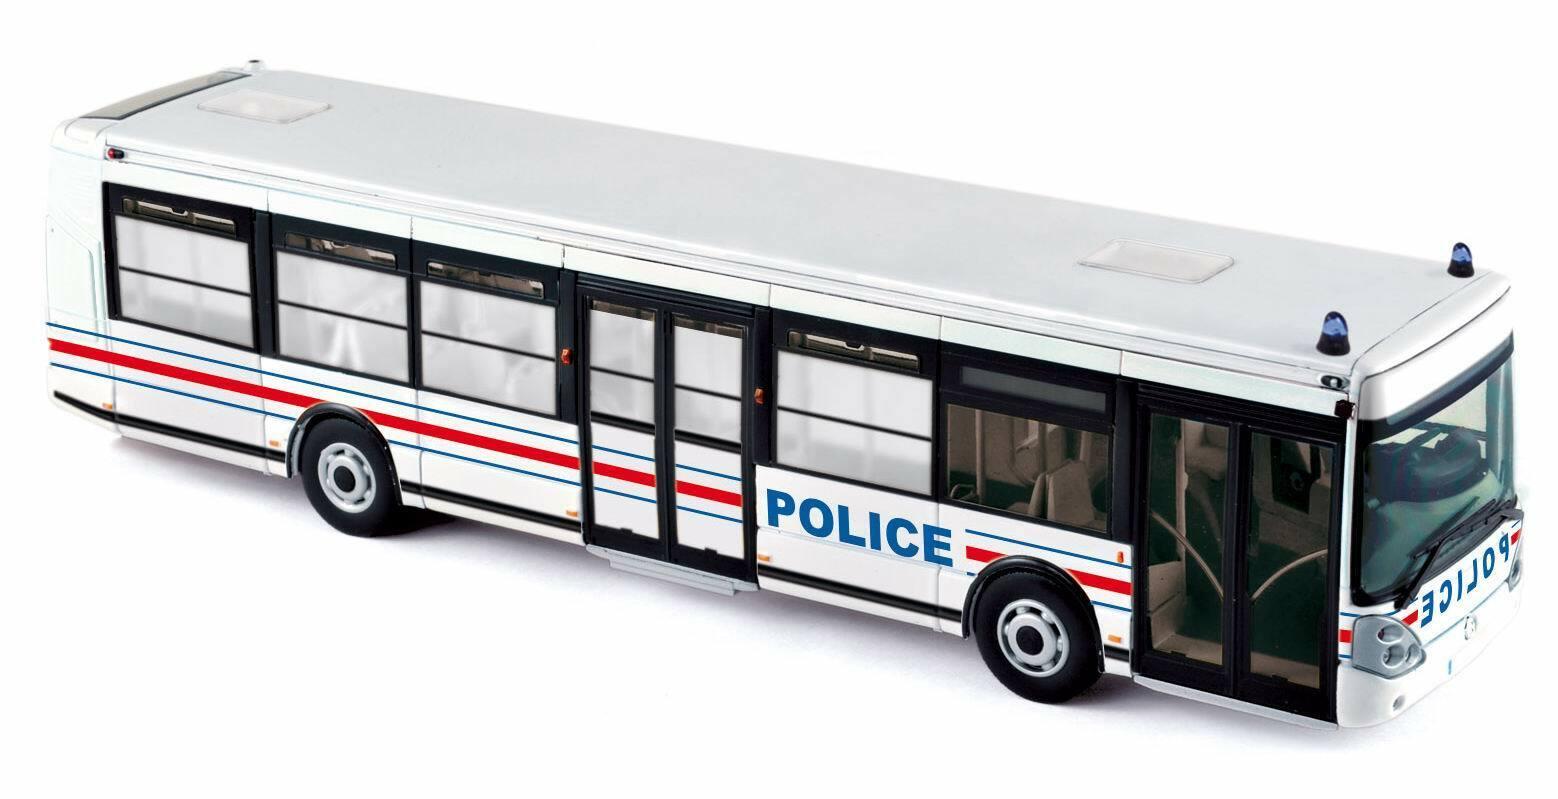 Autobus IRISBUS Agora Citelis Police Transport de personnes interpellées 1 43